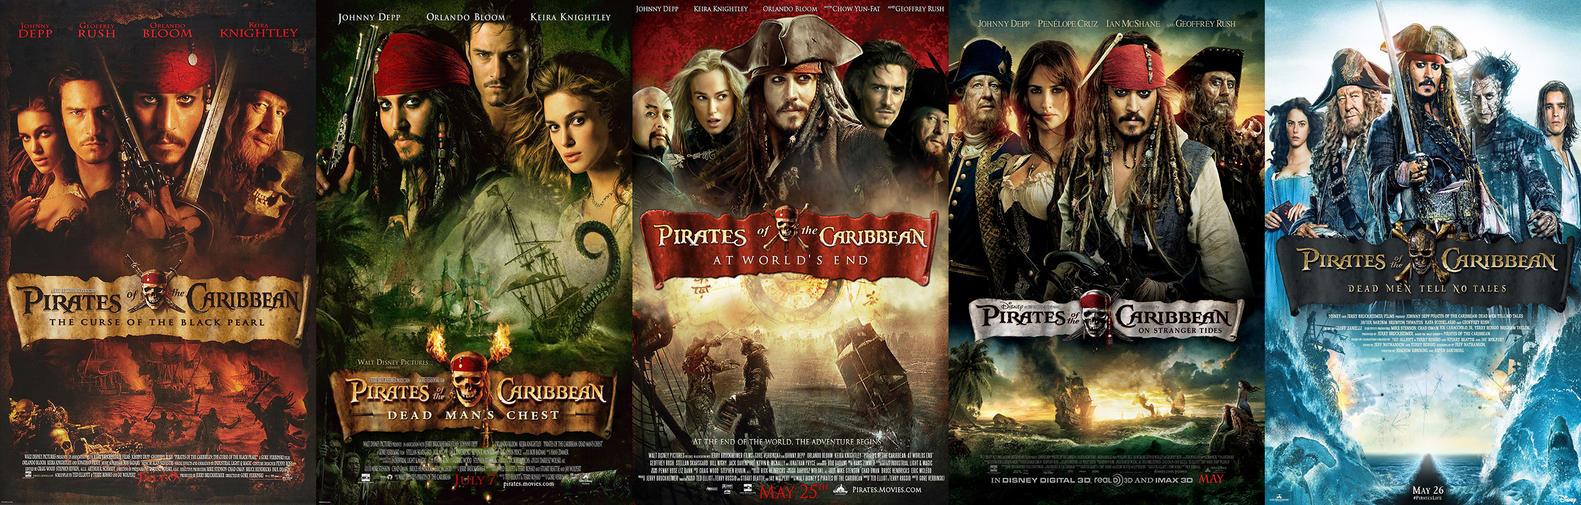 pirates of caribbean 1 full movie download